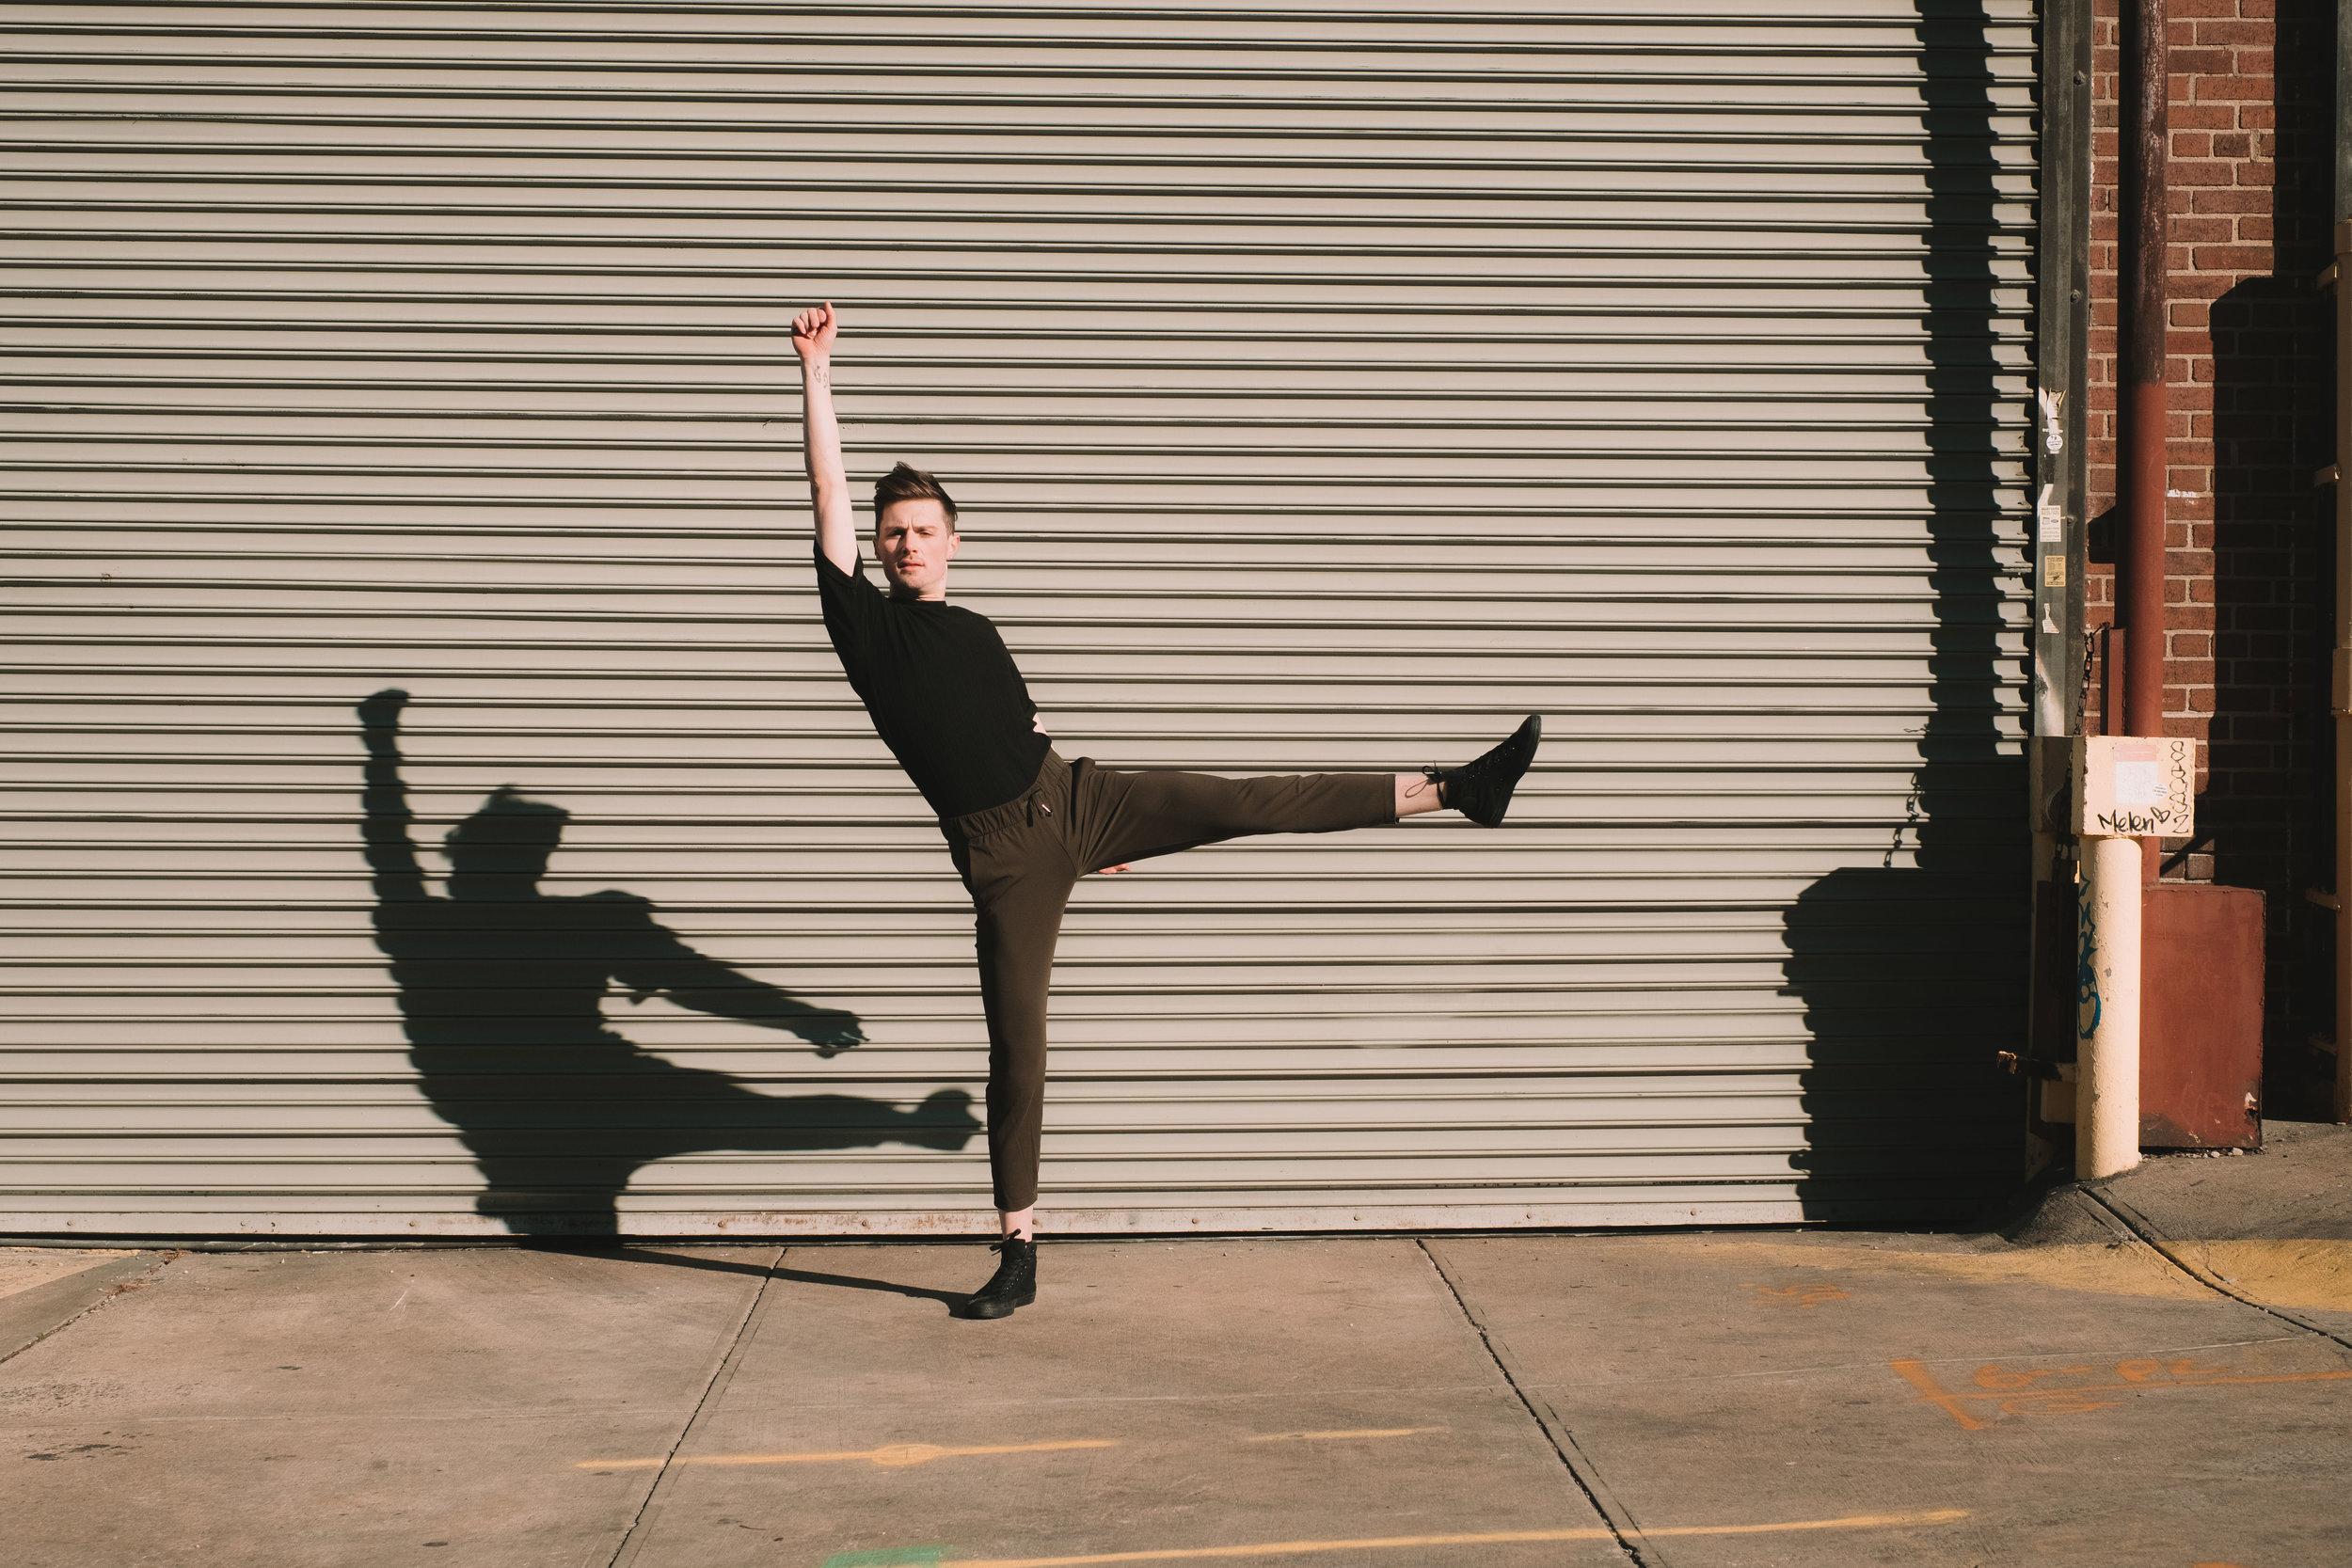 jakee zaccor - jzaccordesigns - yoga photography - kurt joyce